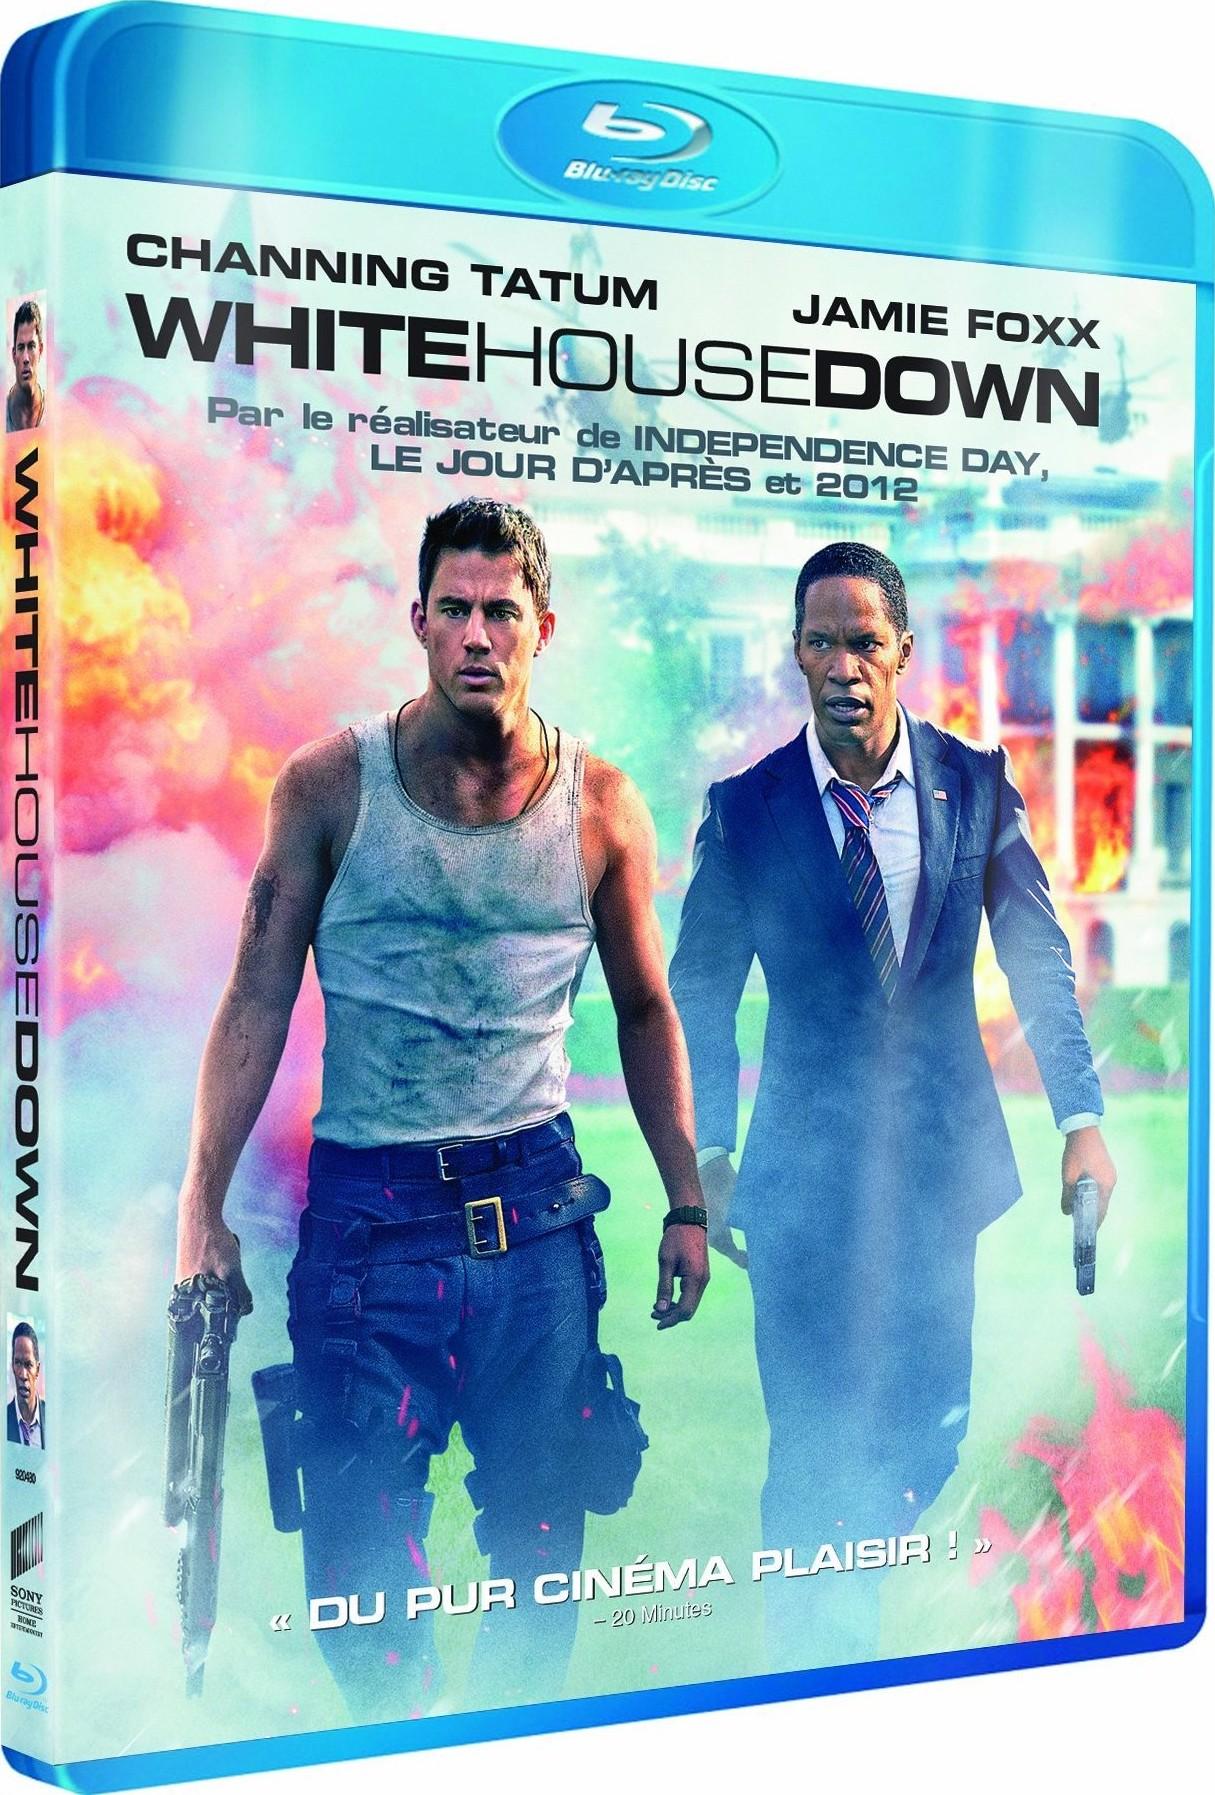 White House Down 1 - White House Down